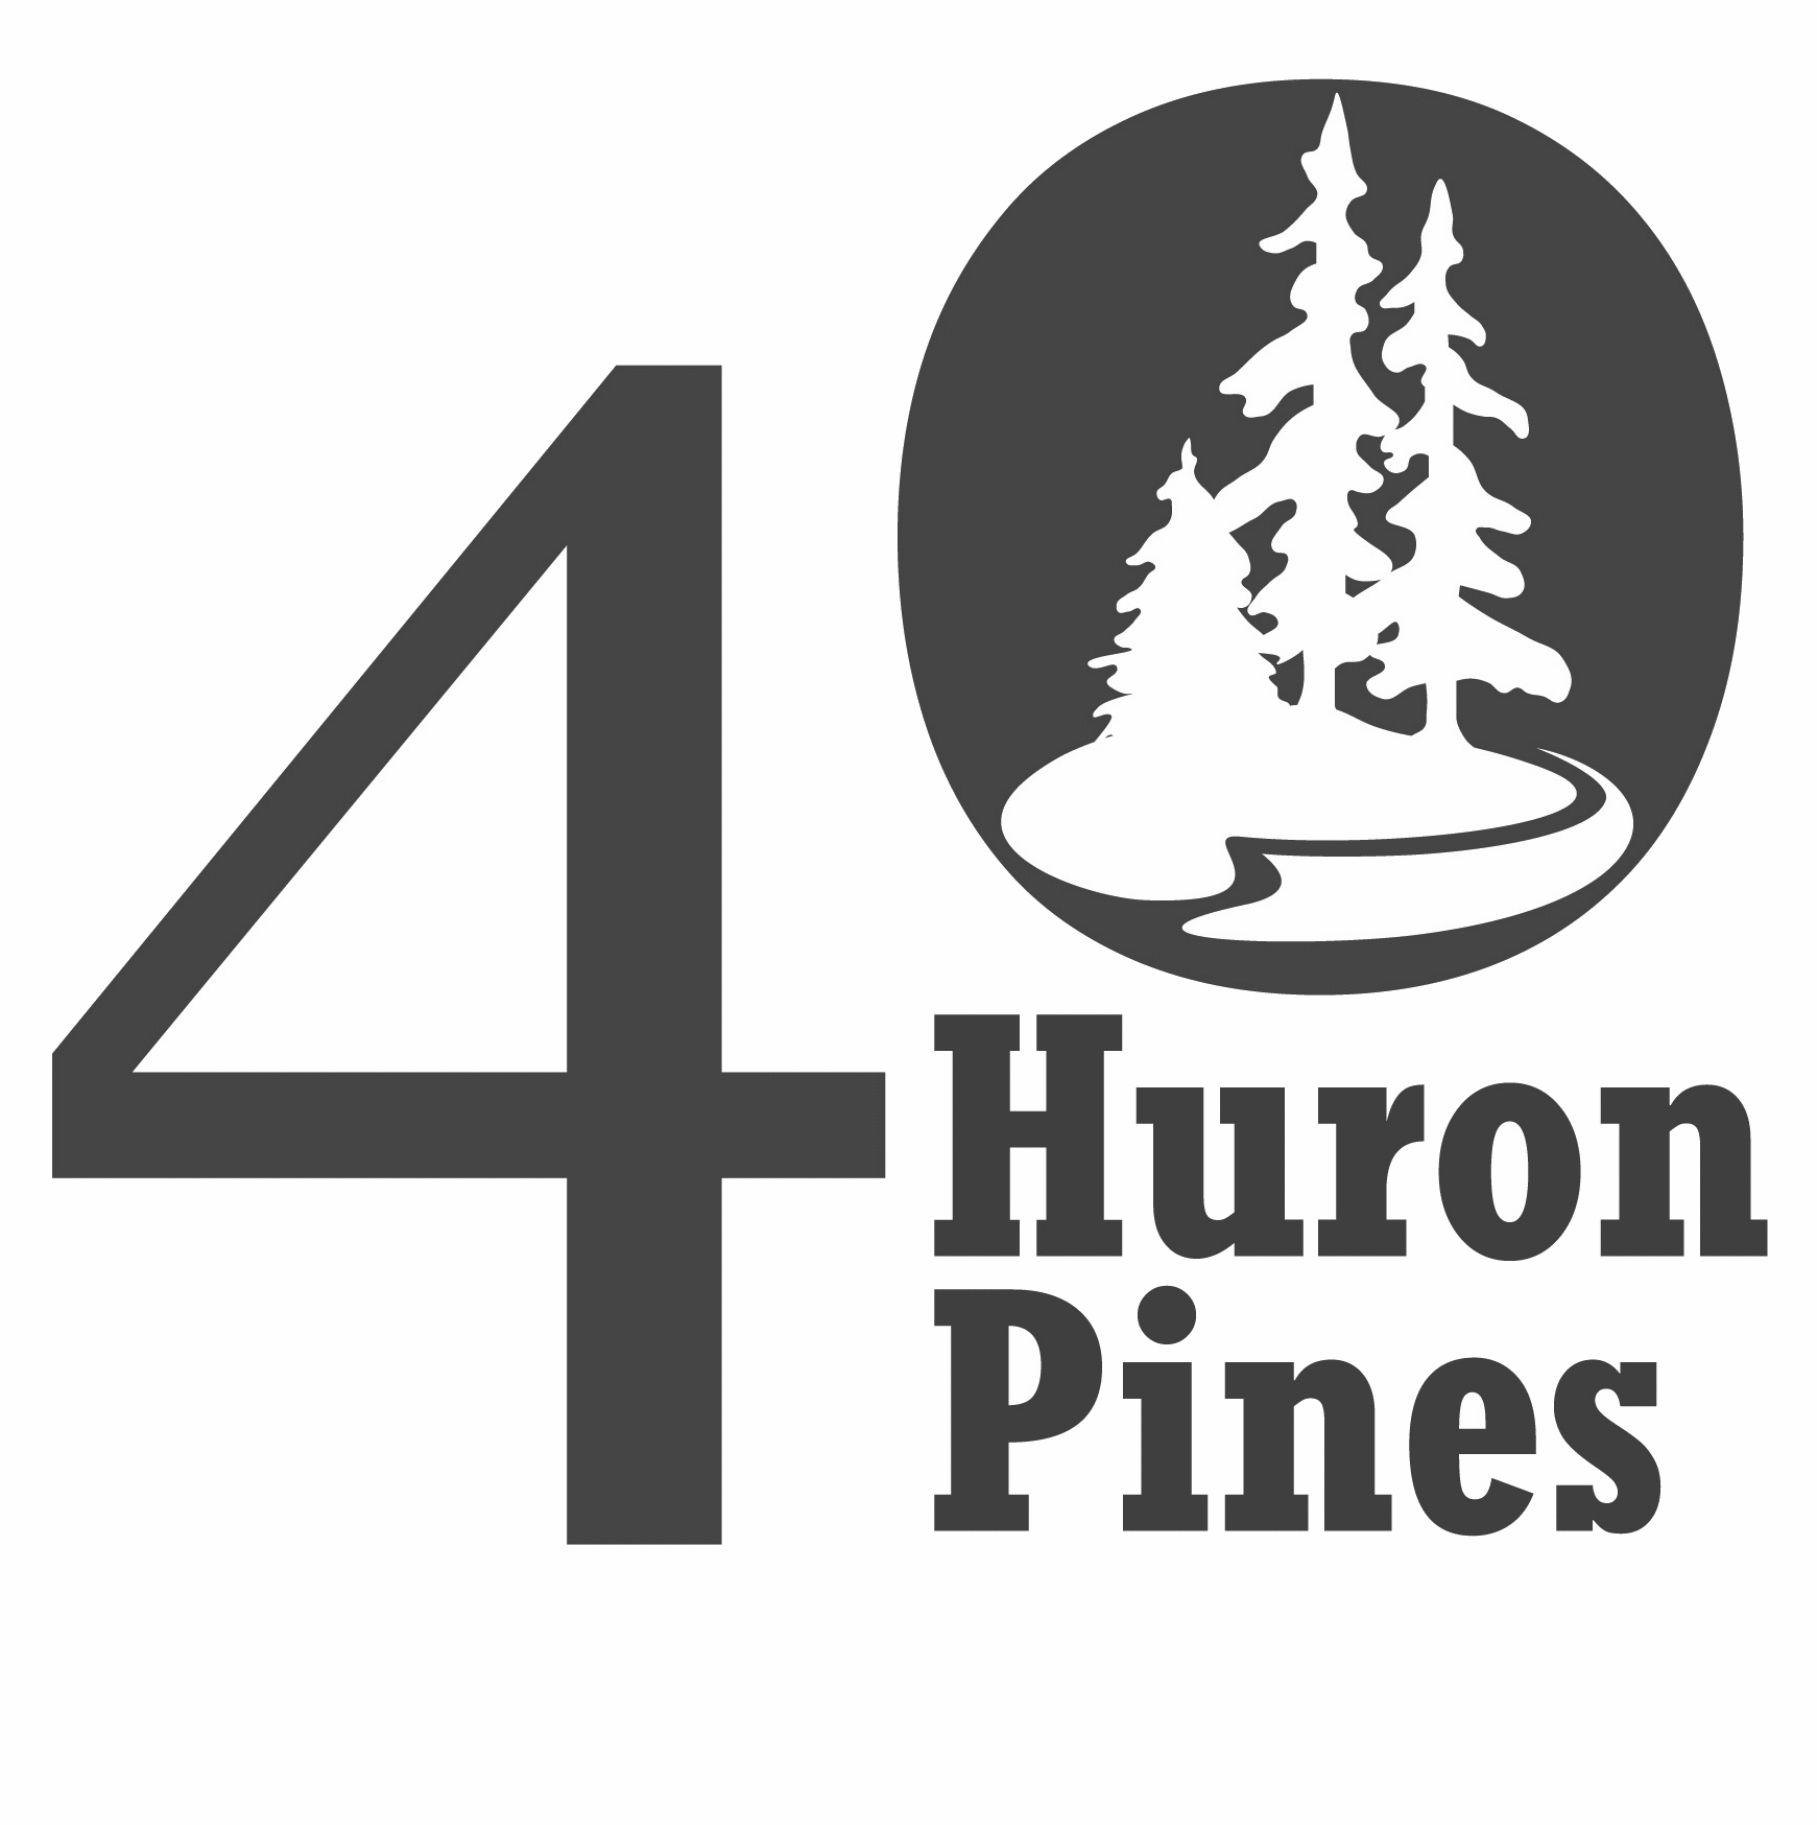 Huron Pines